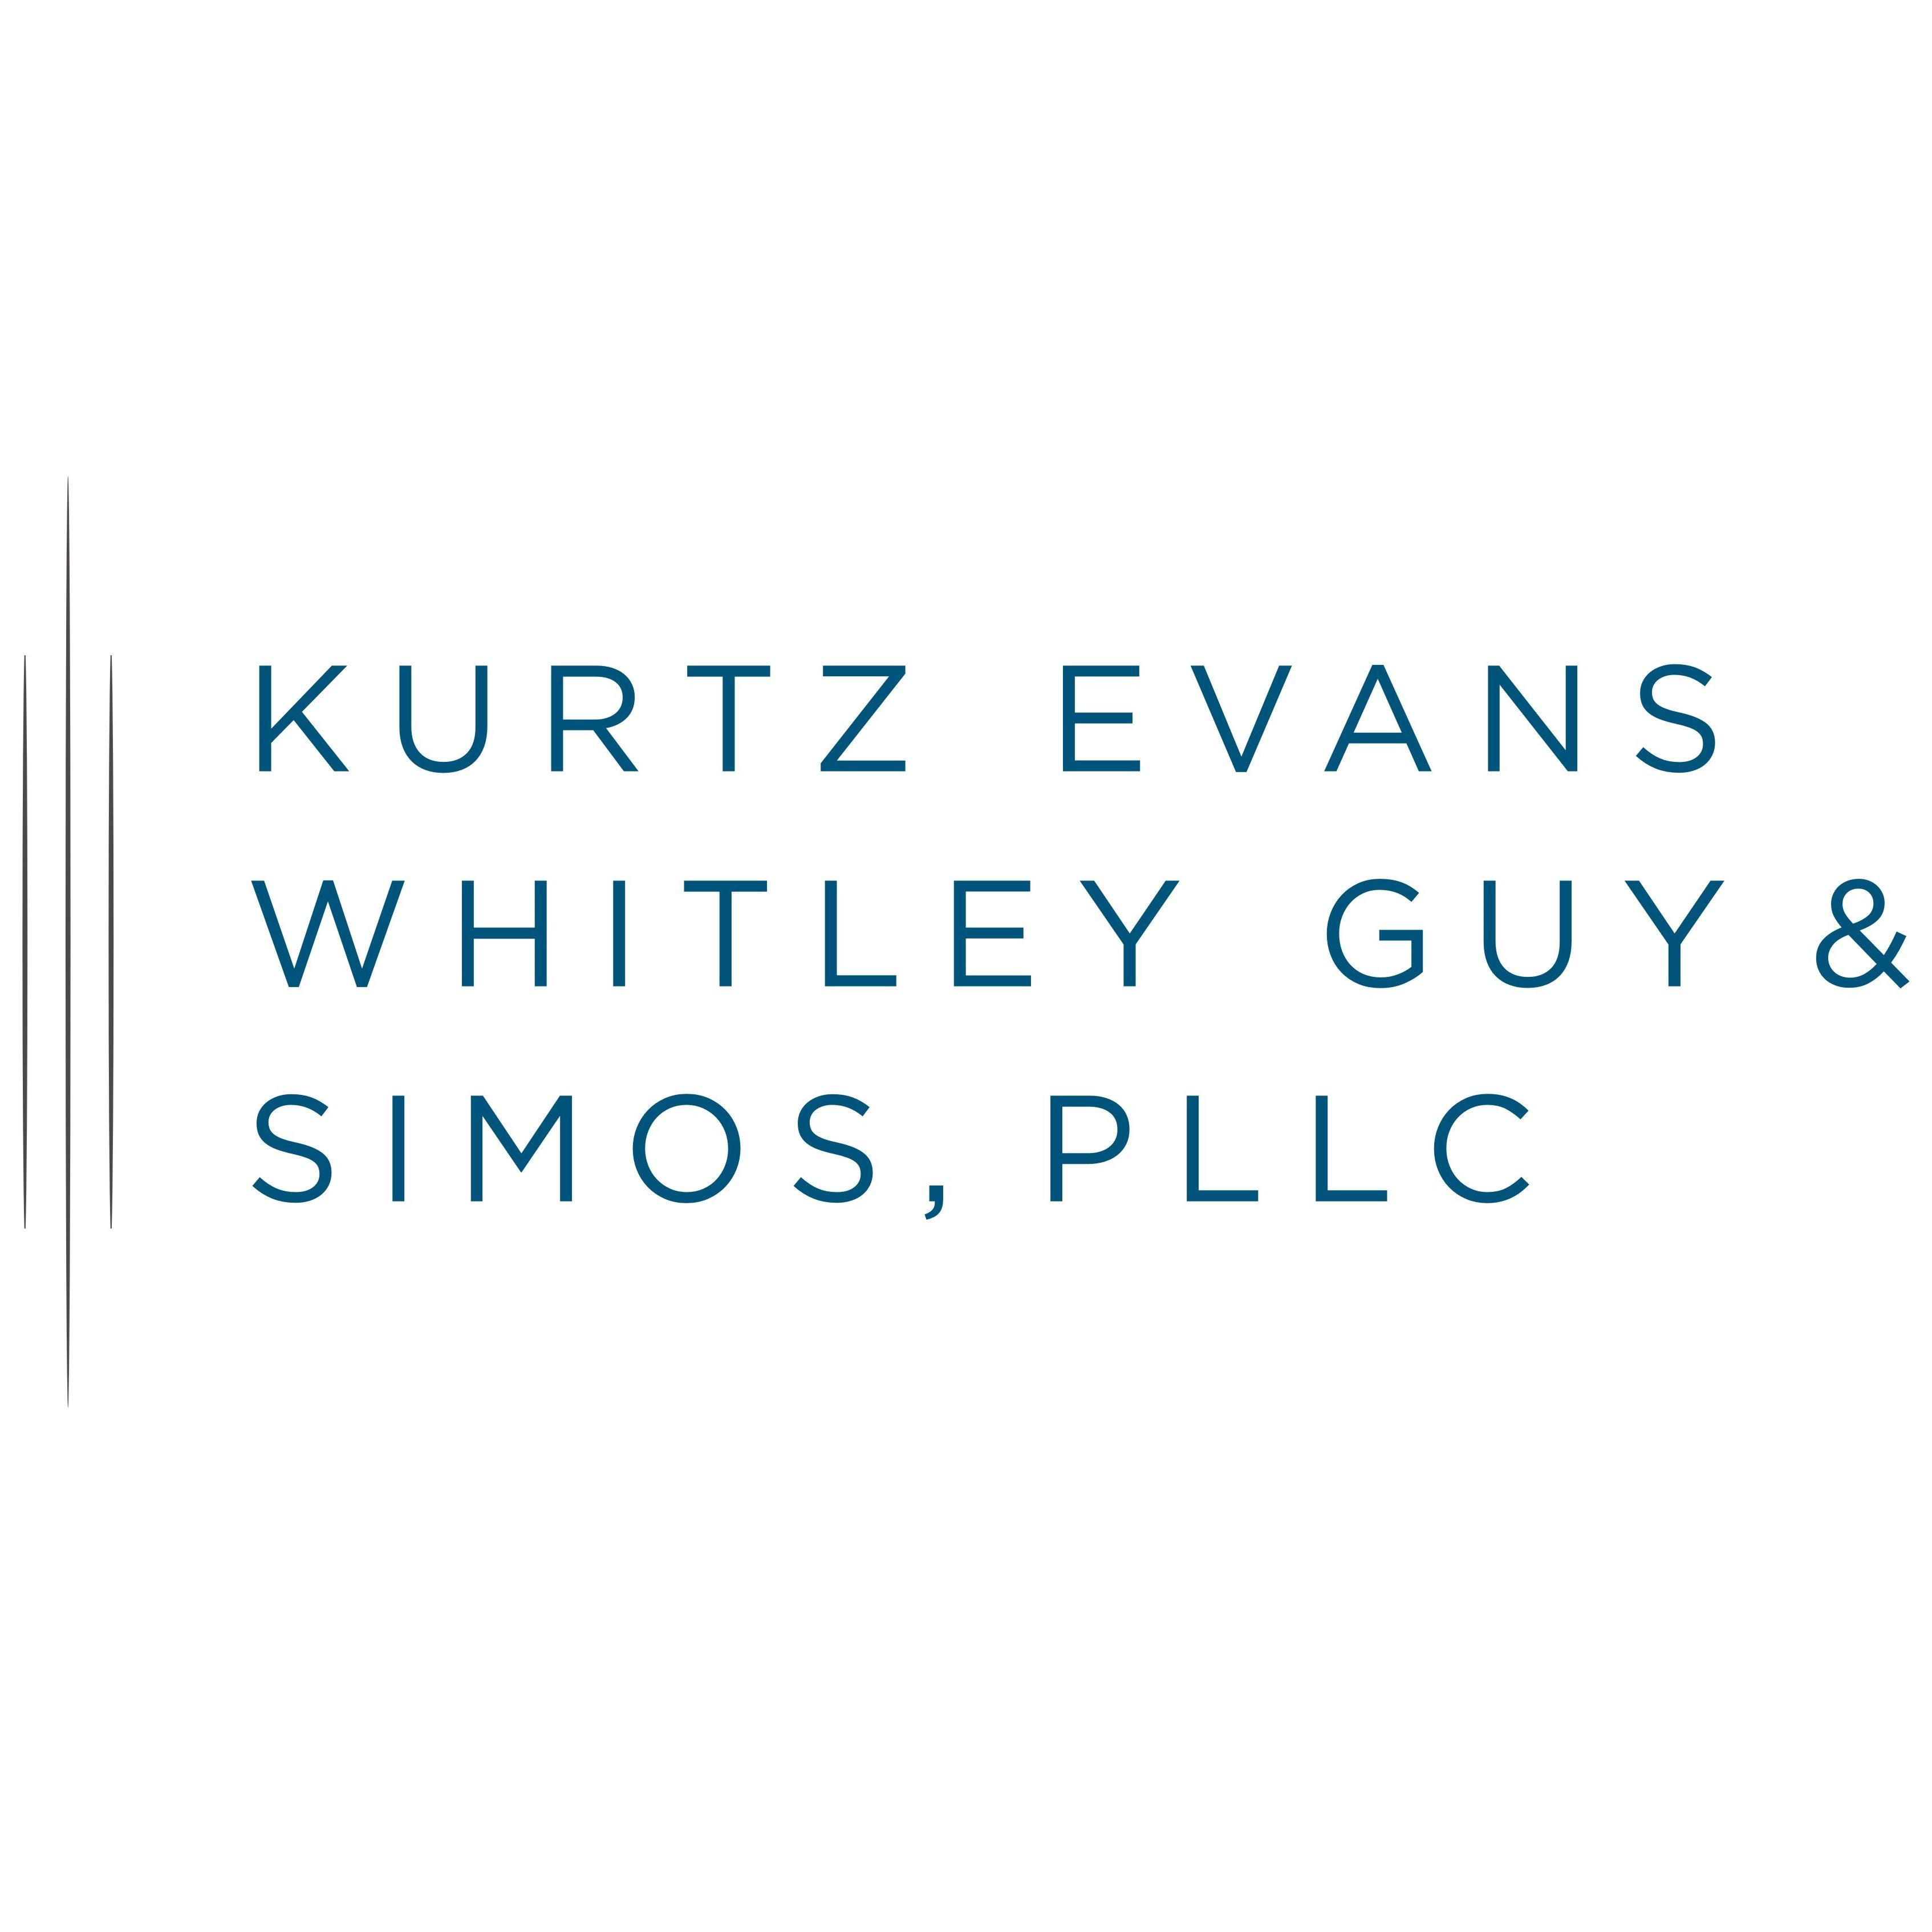 Kurtz Evans Whitley Guy & Simos, PLLC - Winston-Salem, NC - Attorneys